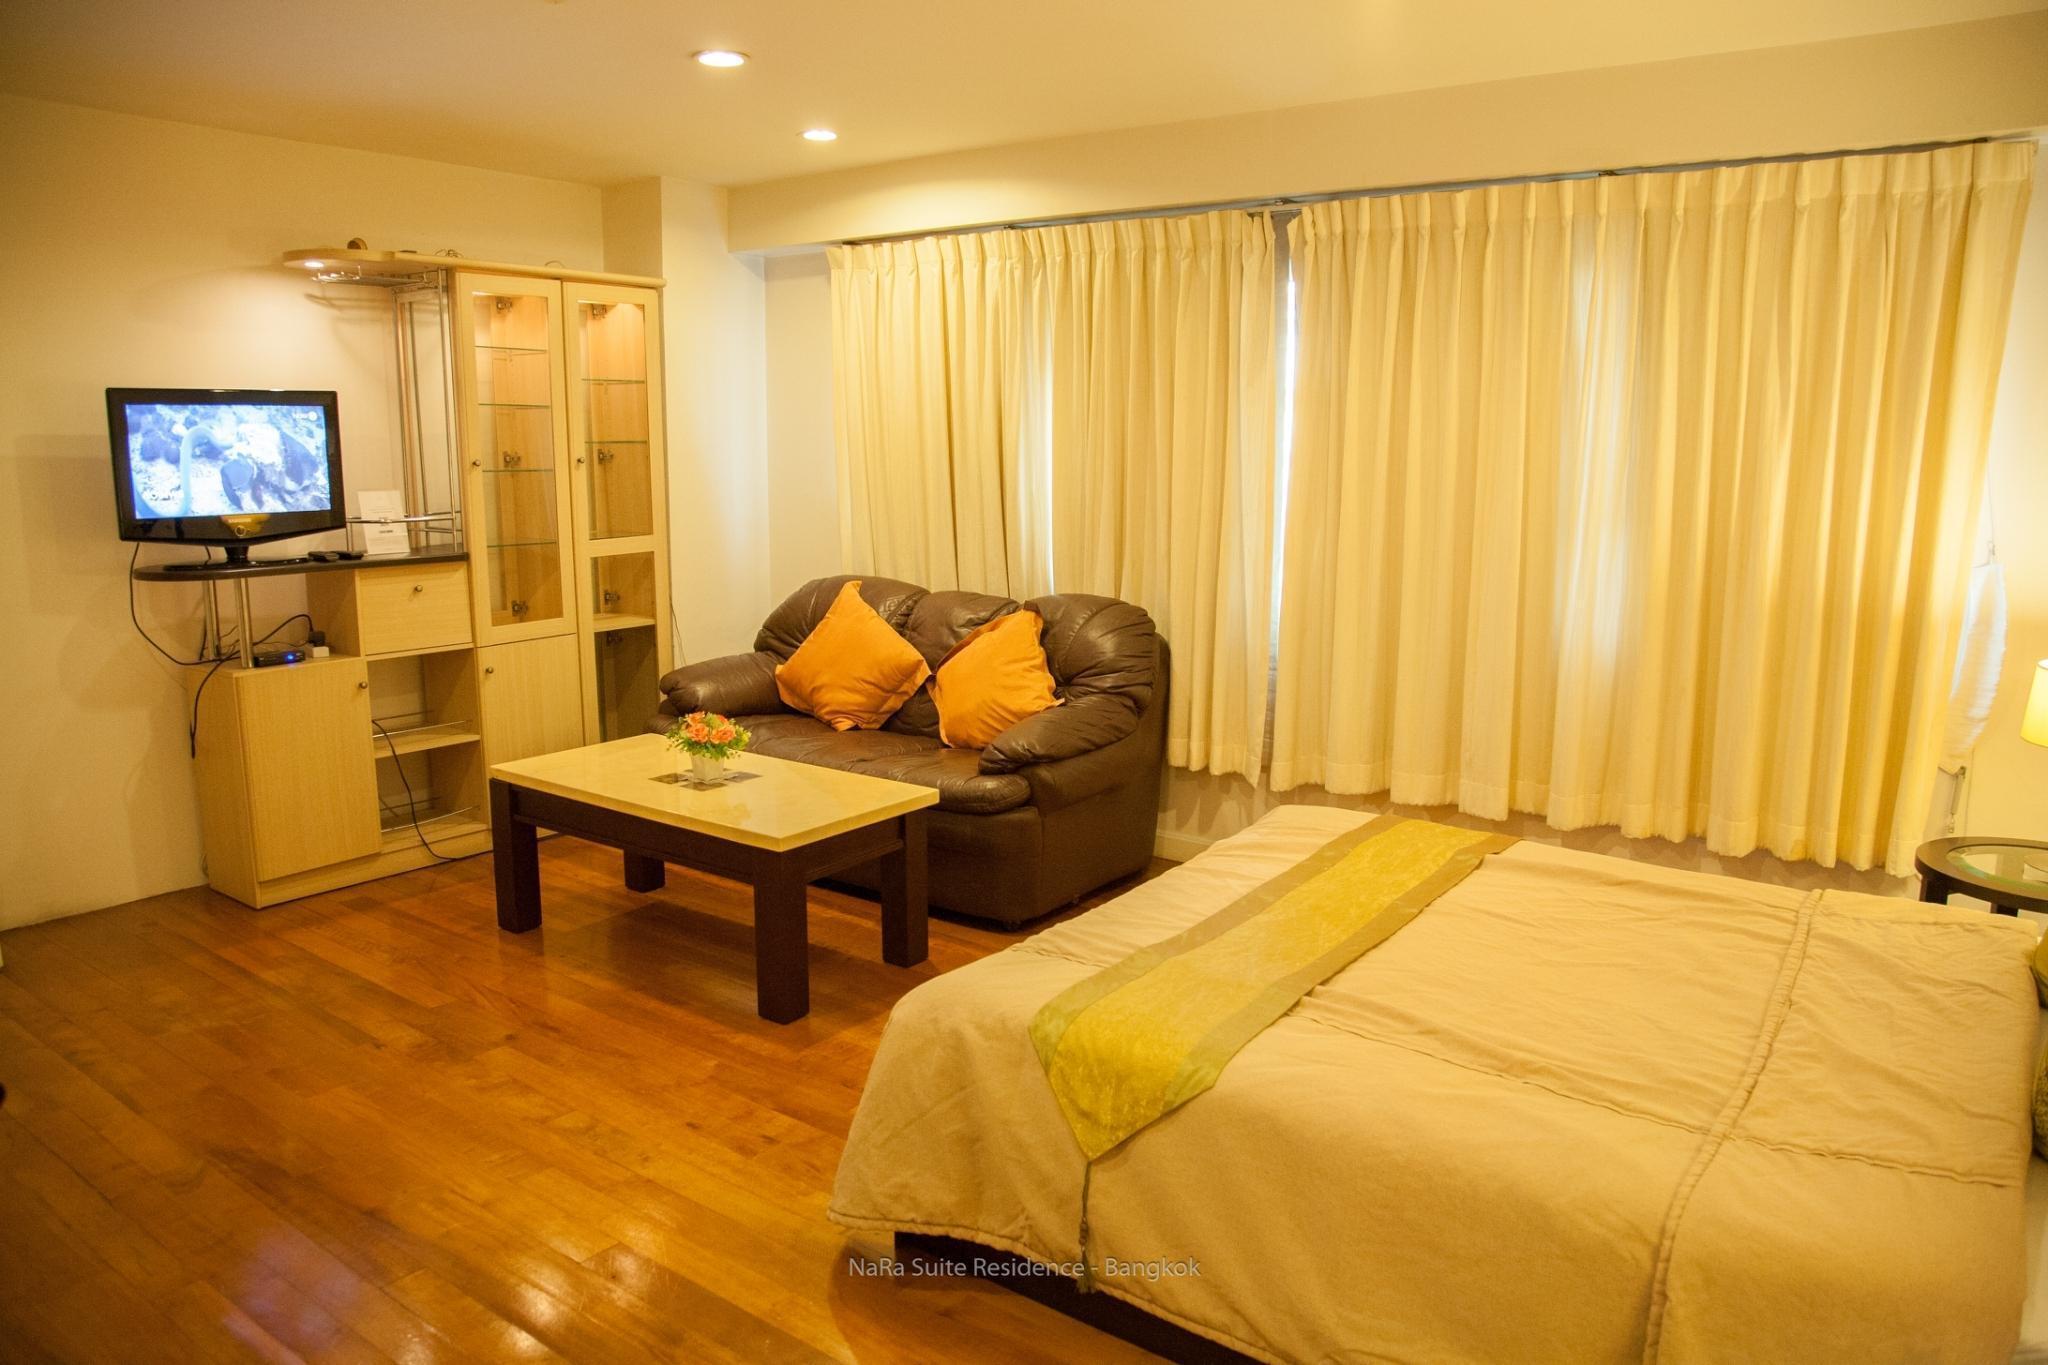 Nara Suite Residence Bangkok นารา สวีท เรสซิเดนซ์ บางกอก